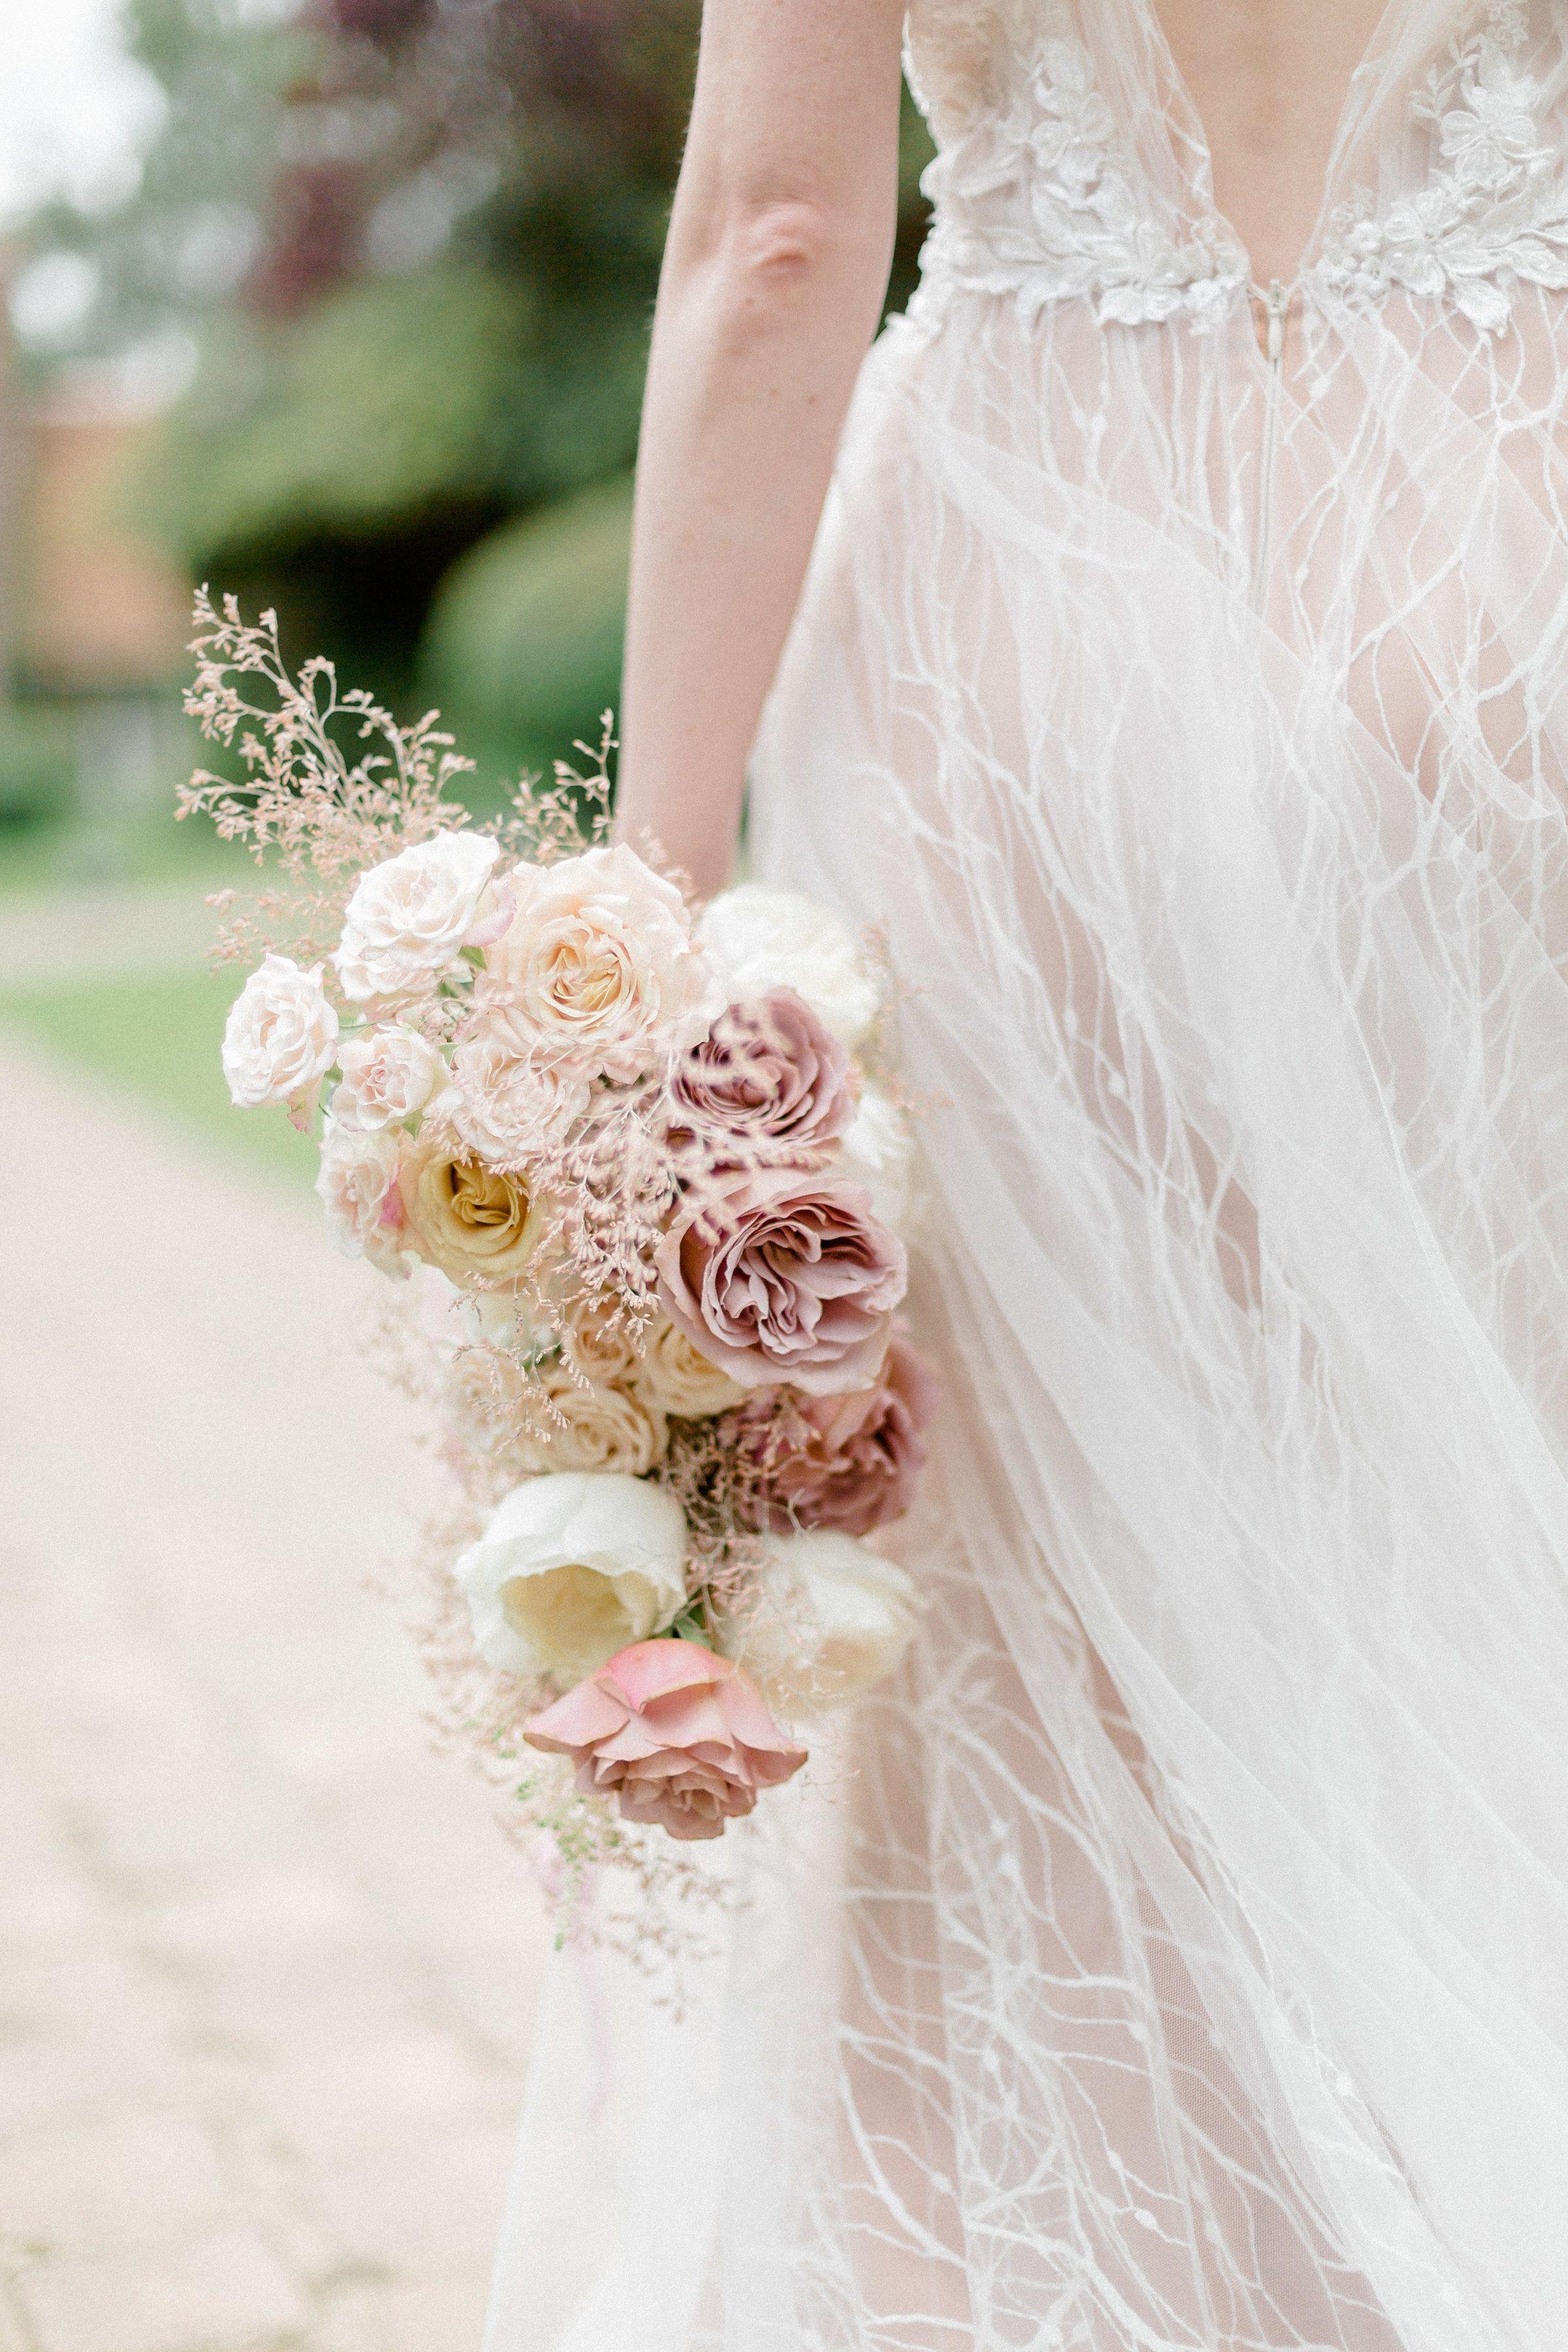 Mariage A La Catrache Mariage Mariage Paris Bouquet De Mariage